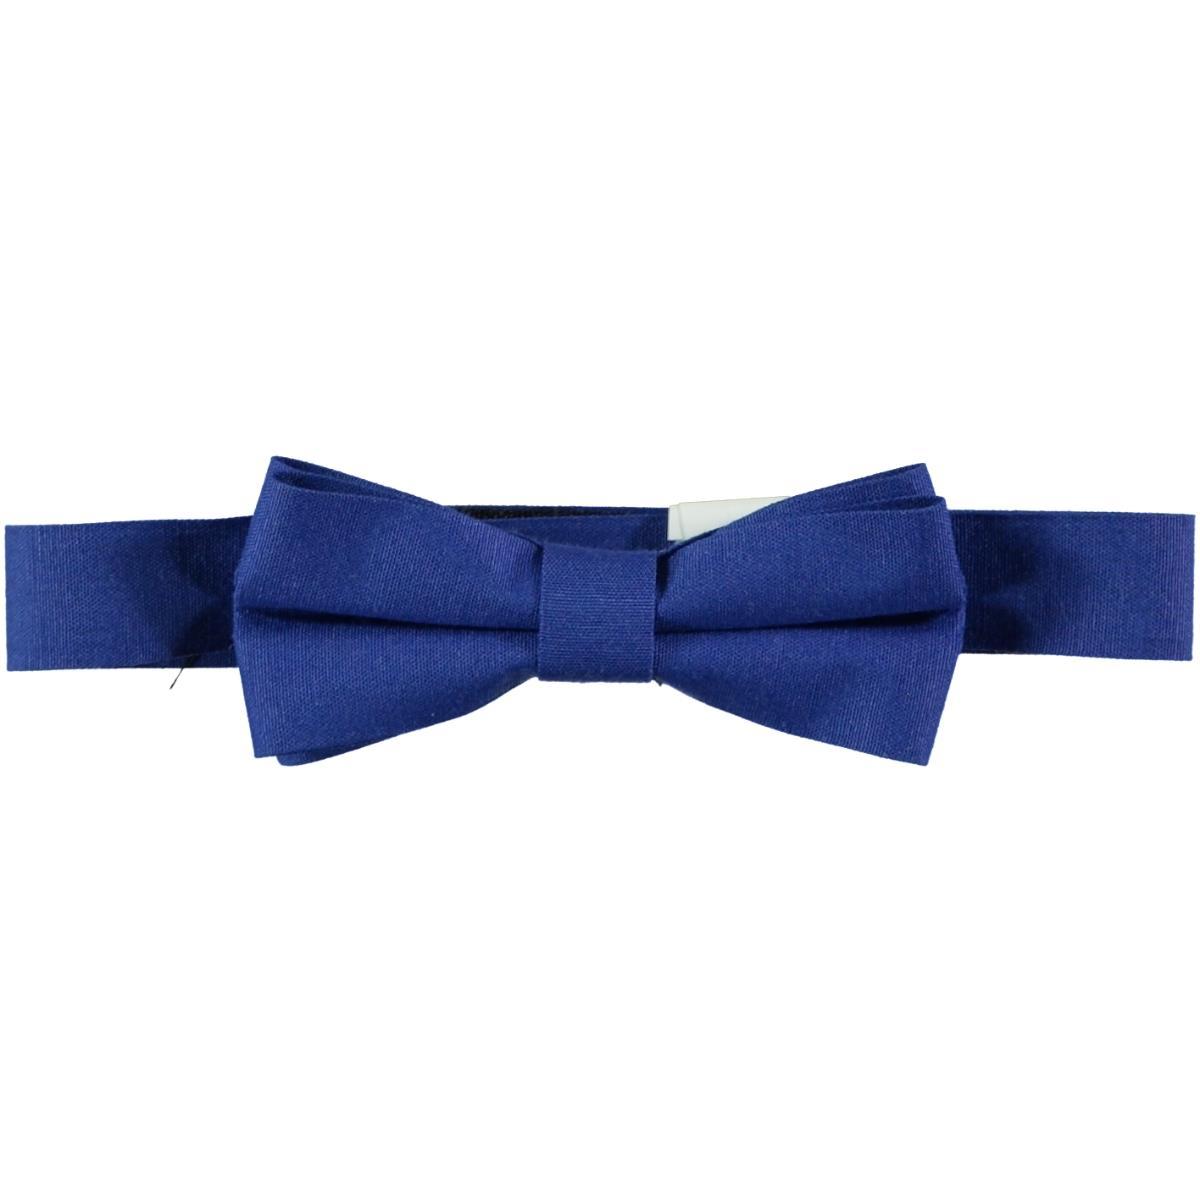 Civil Boy Blue Bow Tie Saks